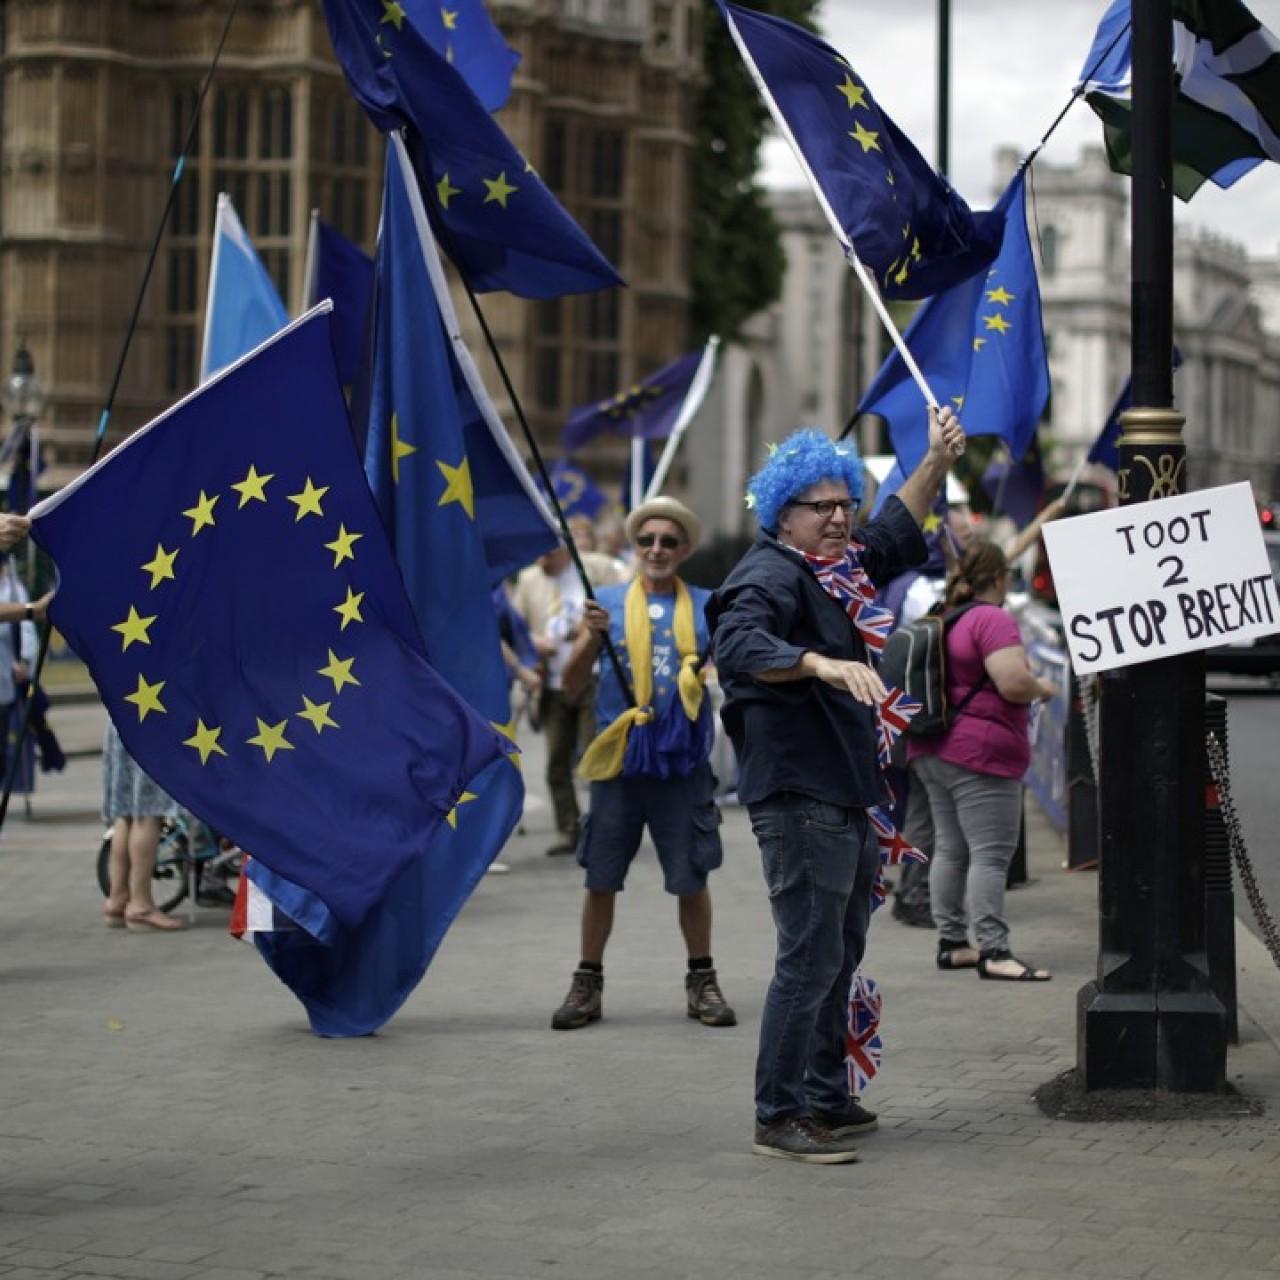 Money UK has lost since Brexit vote exceeds EU budget